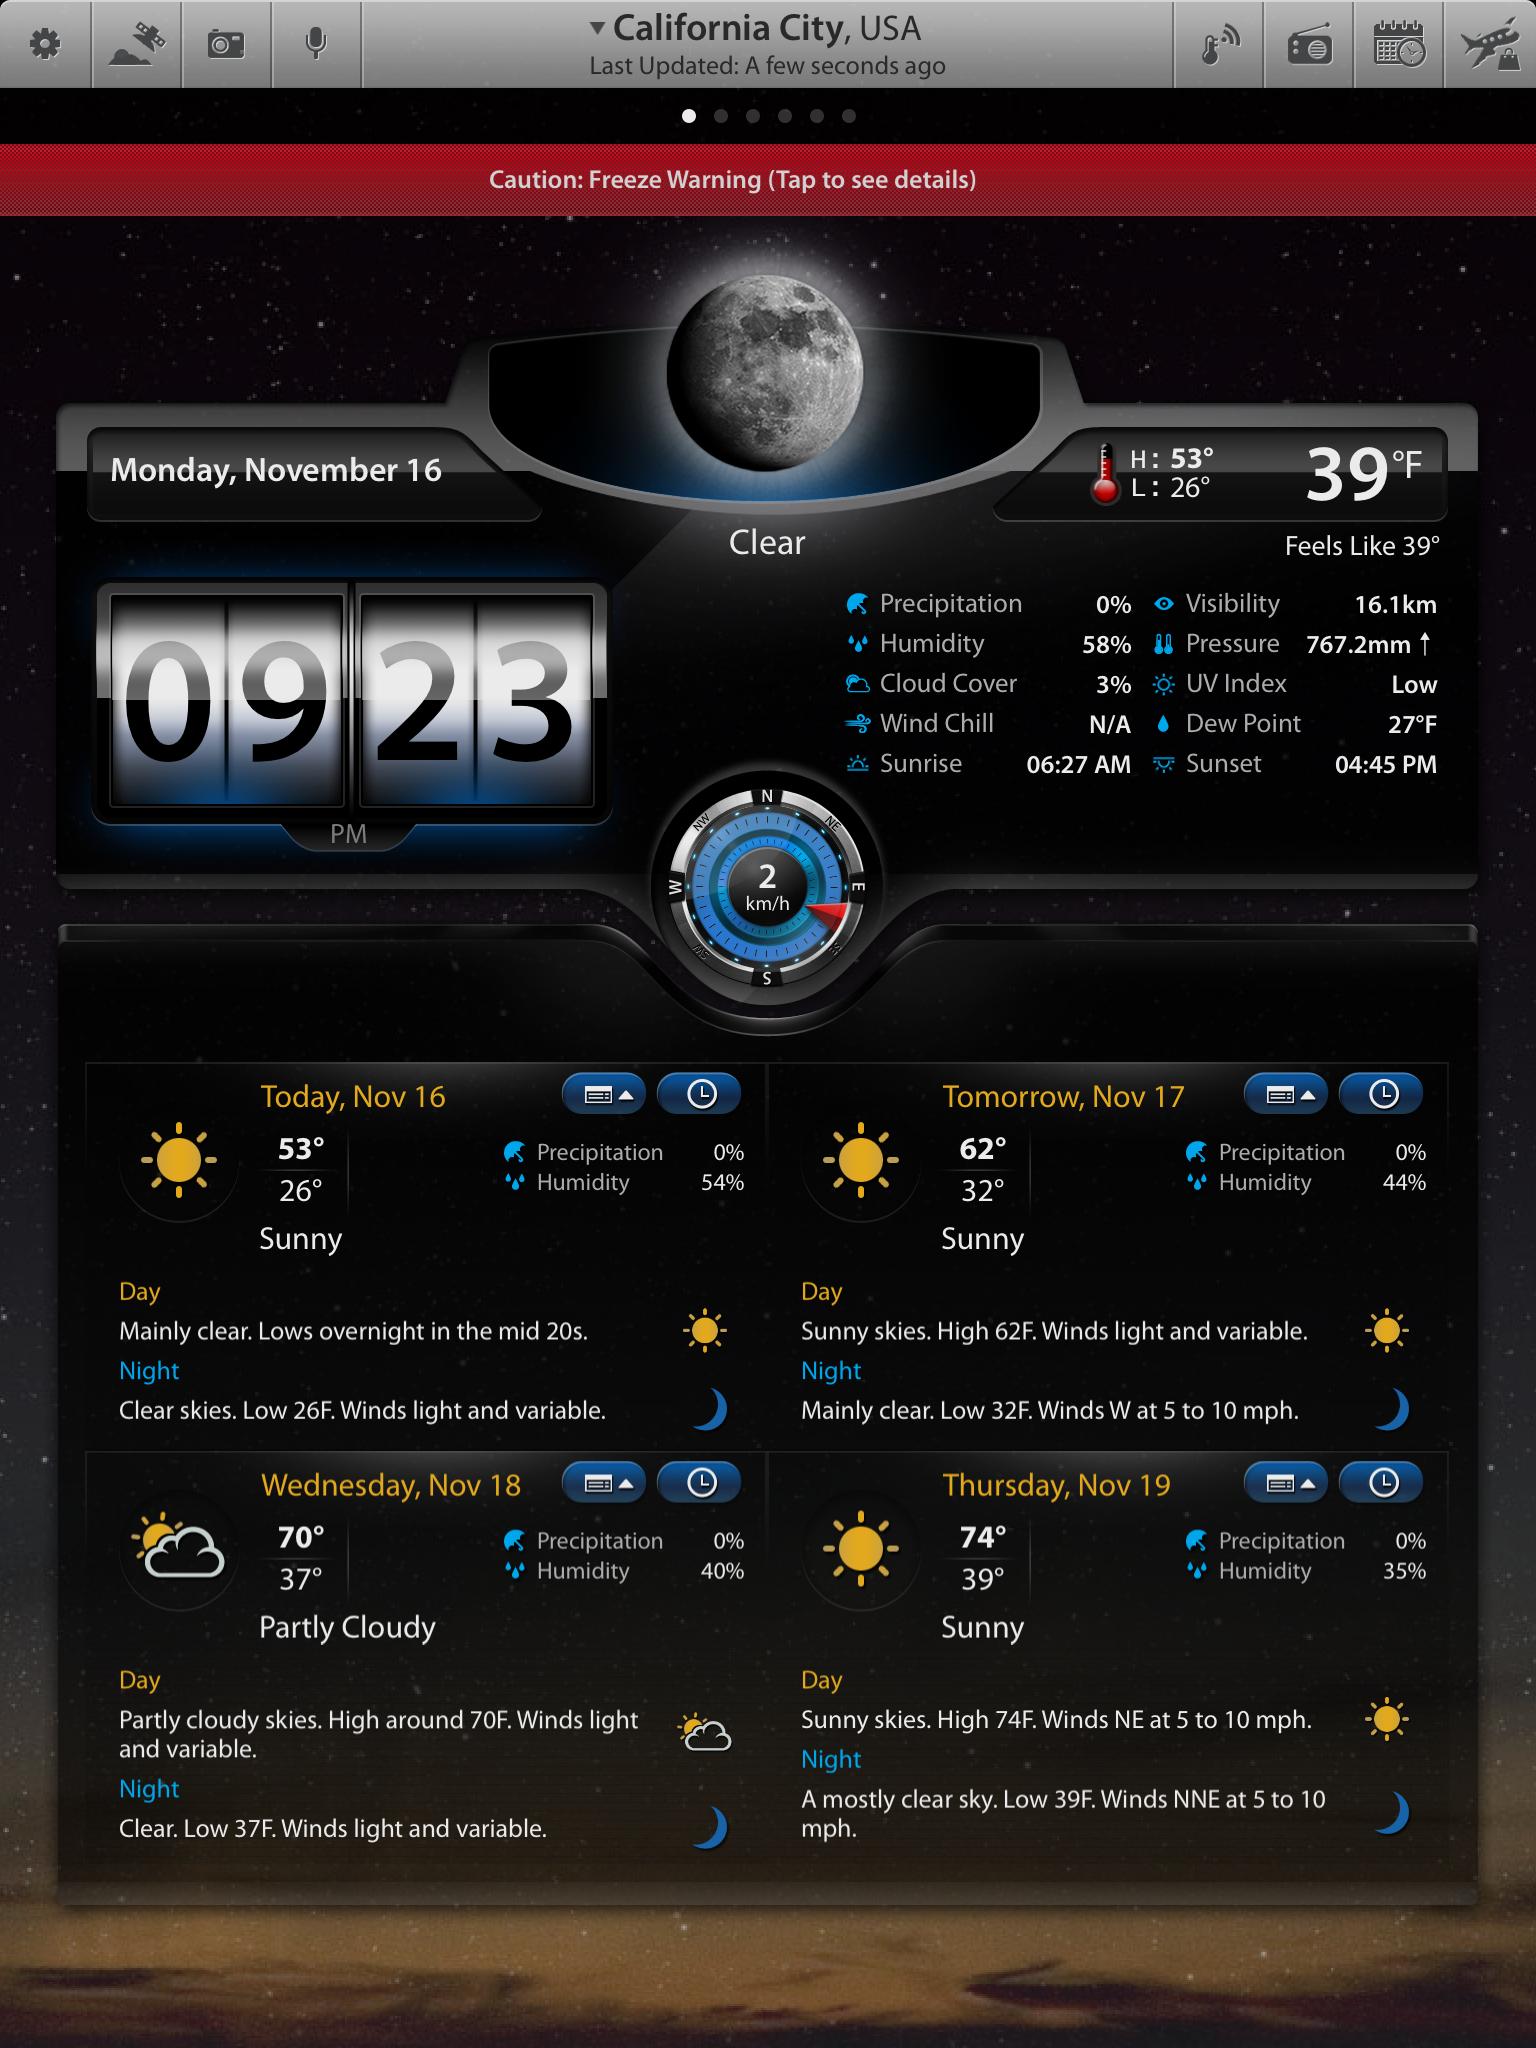 Weather Summary